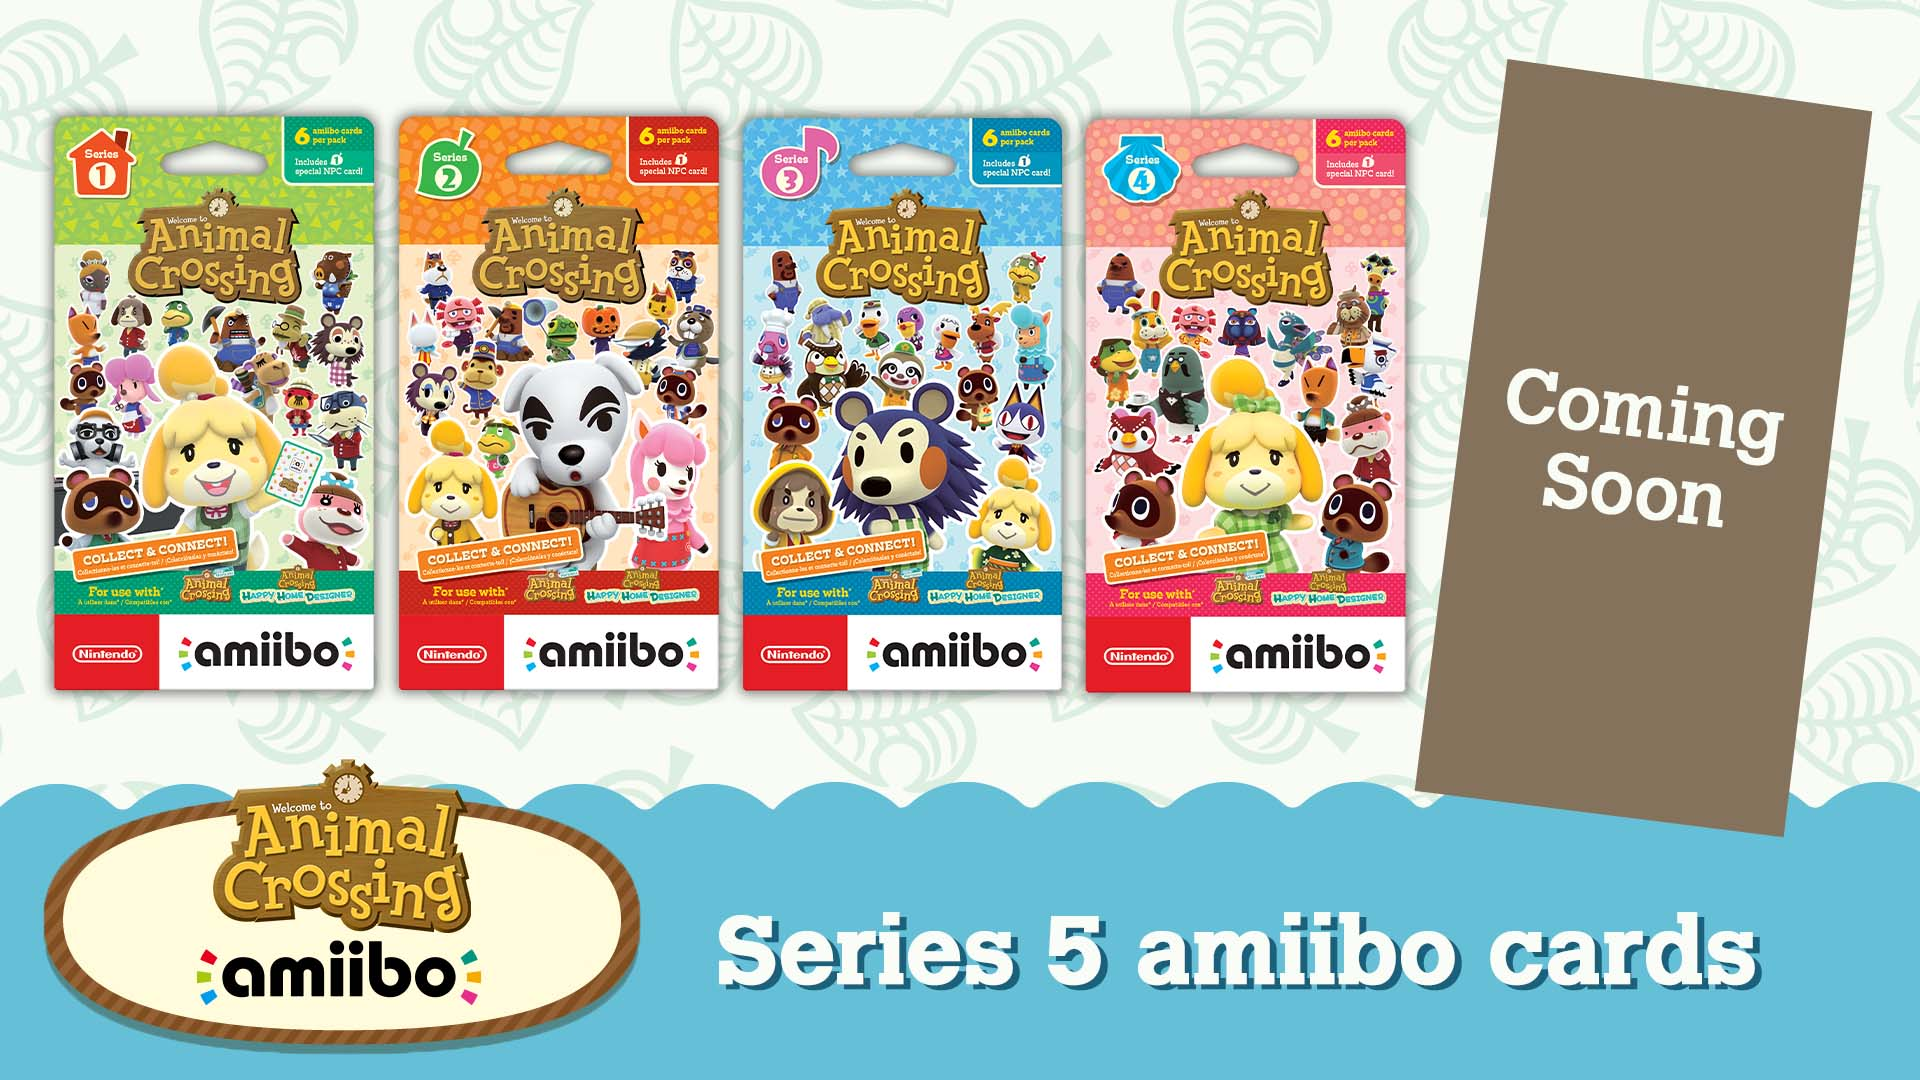 For 2021, new Animal Crossing Amiibo Card